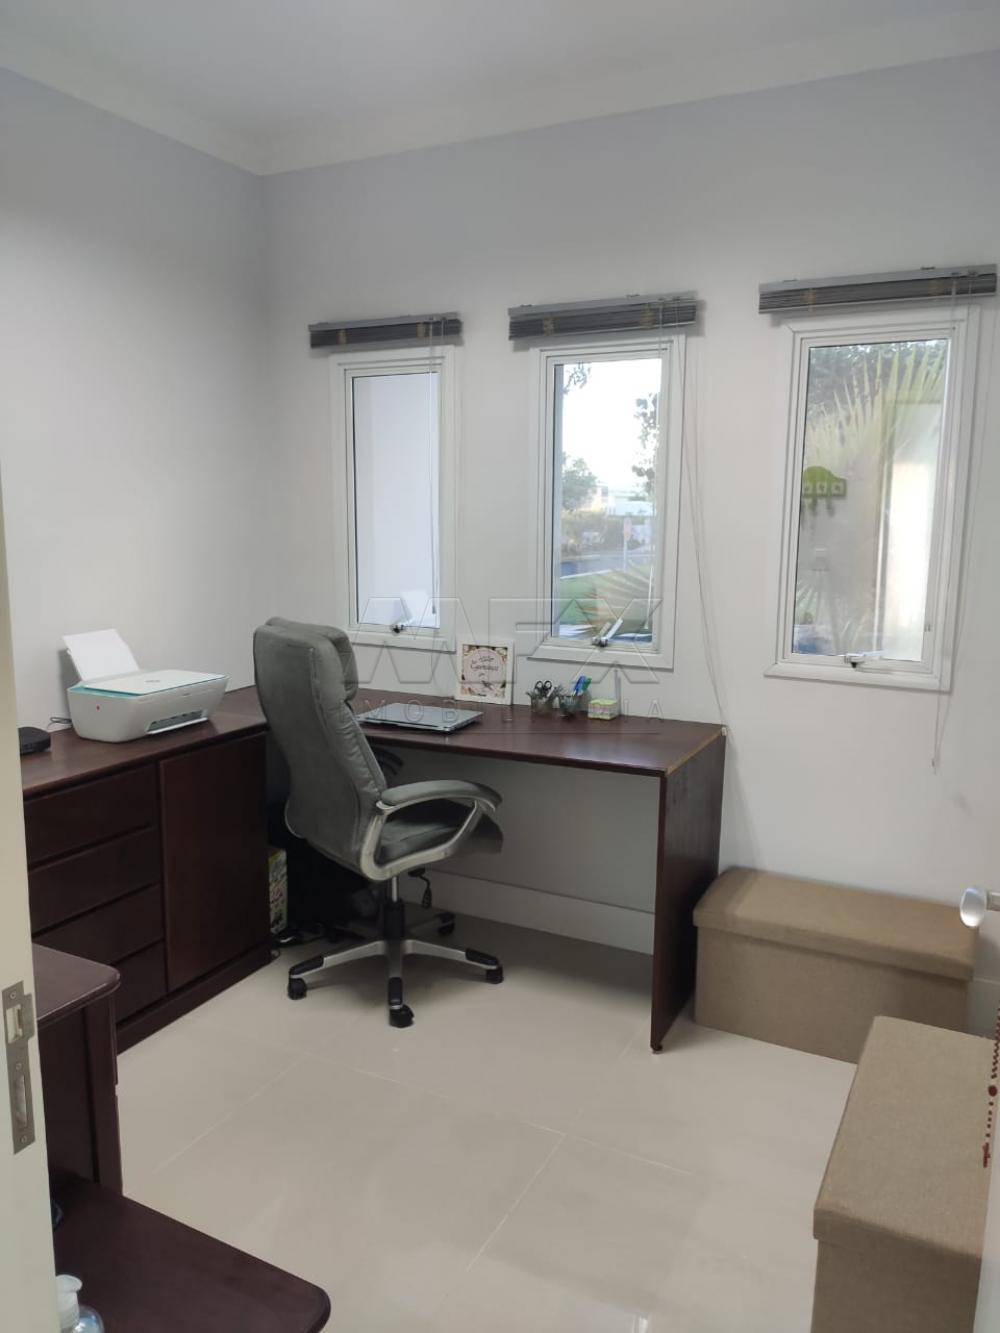 Comprar Casa / Condomínio em Bauru apenas R$ 1.800.000,00 - Foto 15